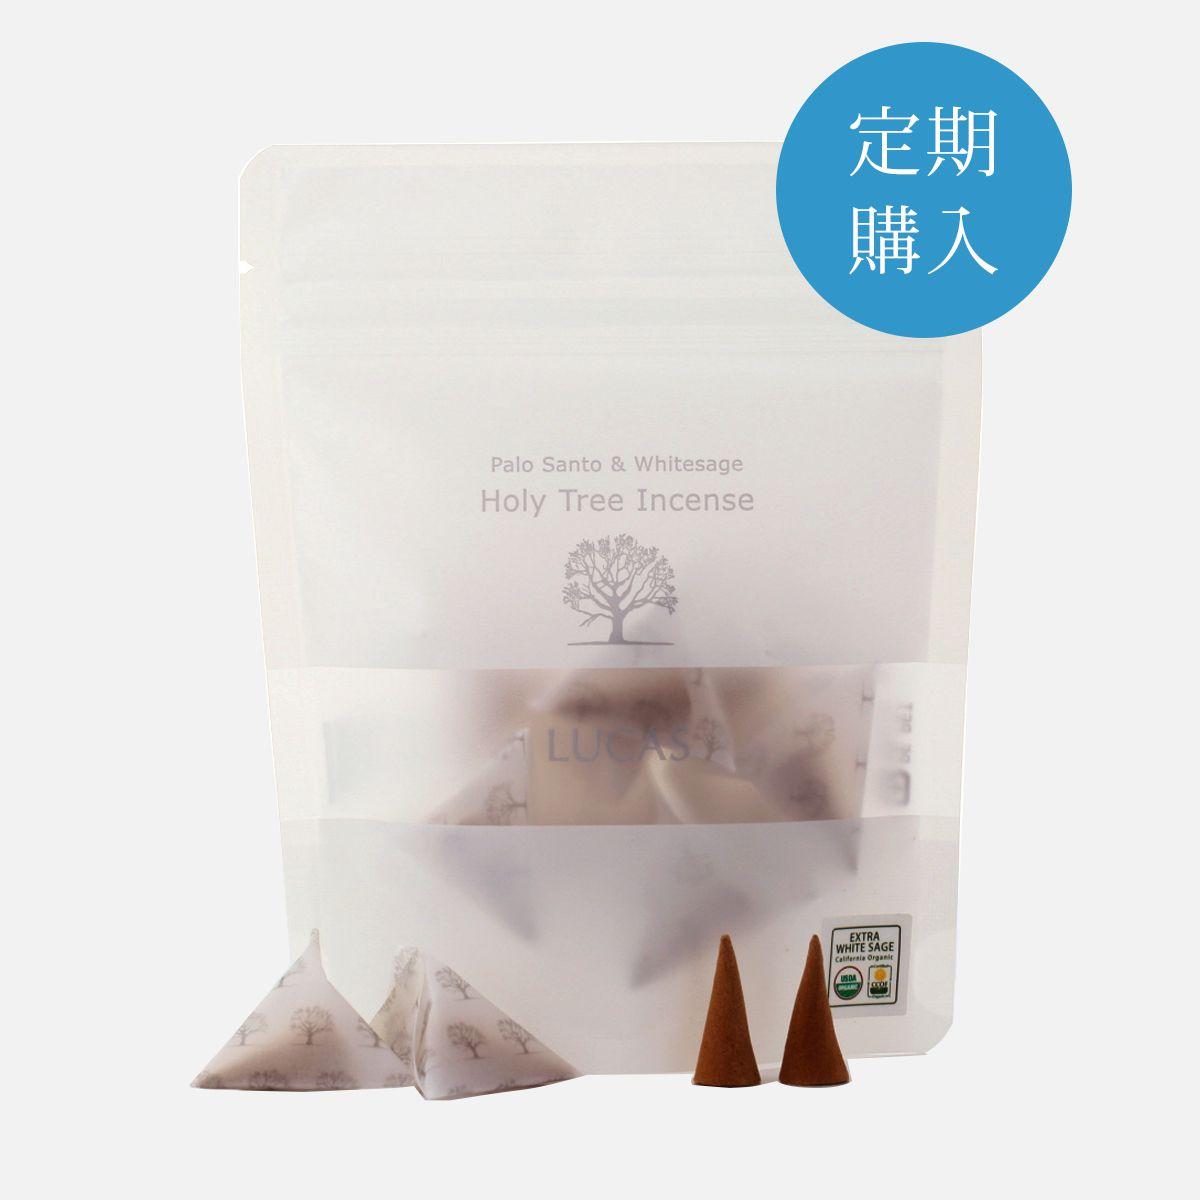 LUCAS パロサント&ホワイトセージ 浄化香 [ ヒーリング・浄化用 ]